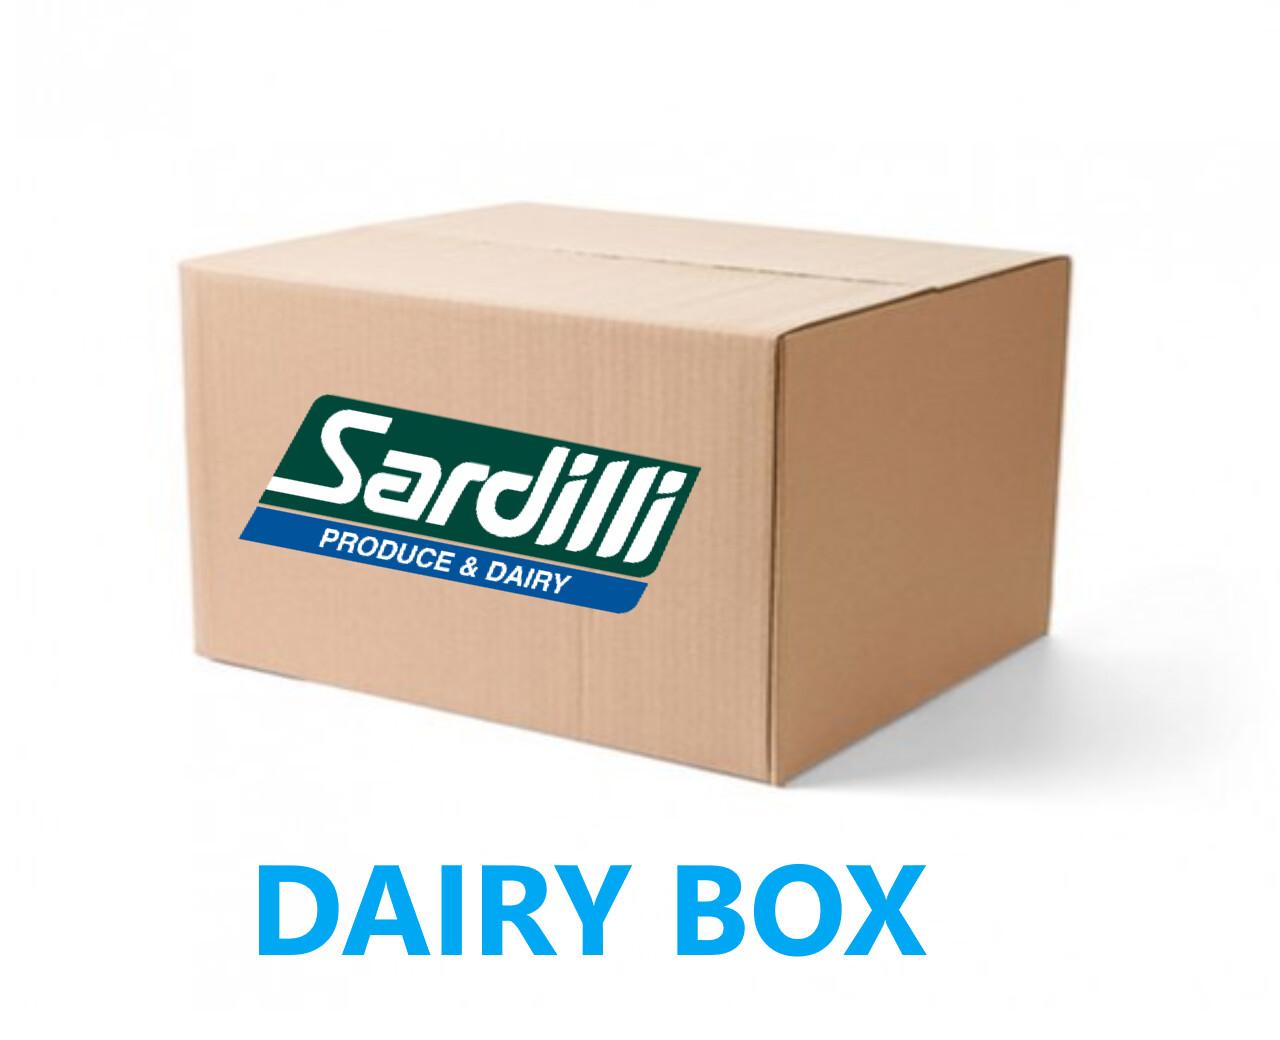 DAIRY BOX - We tried something new.